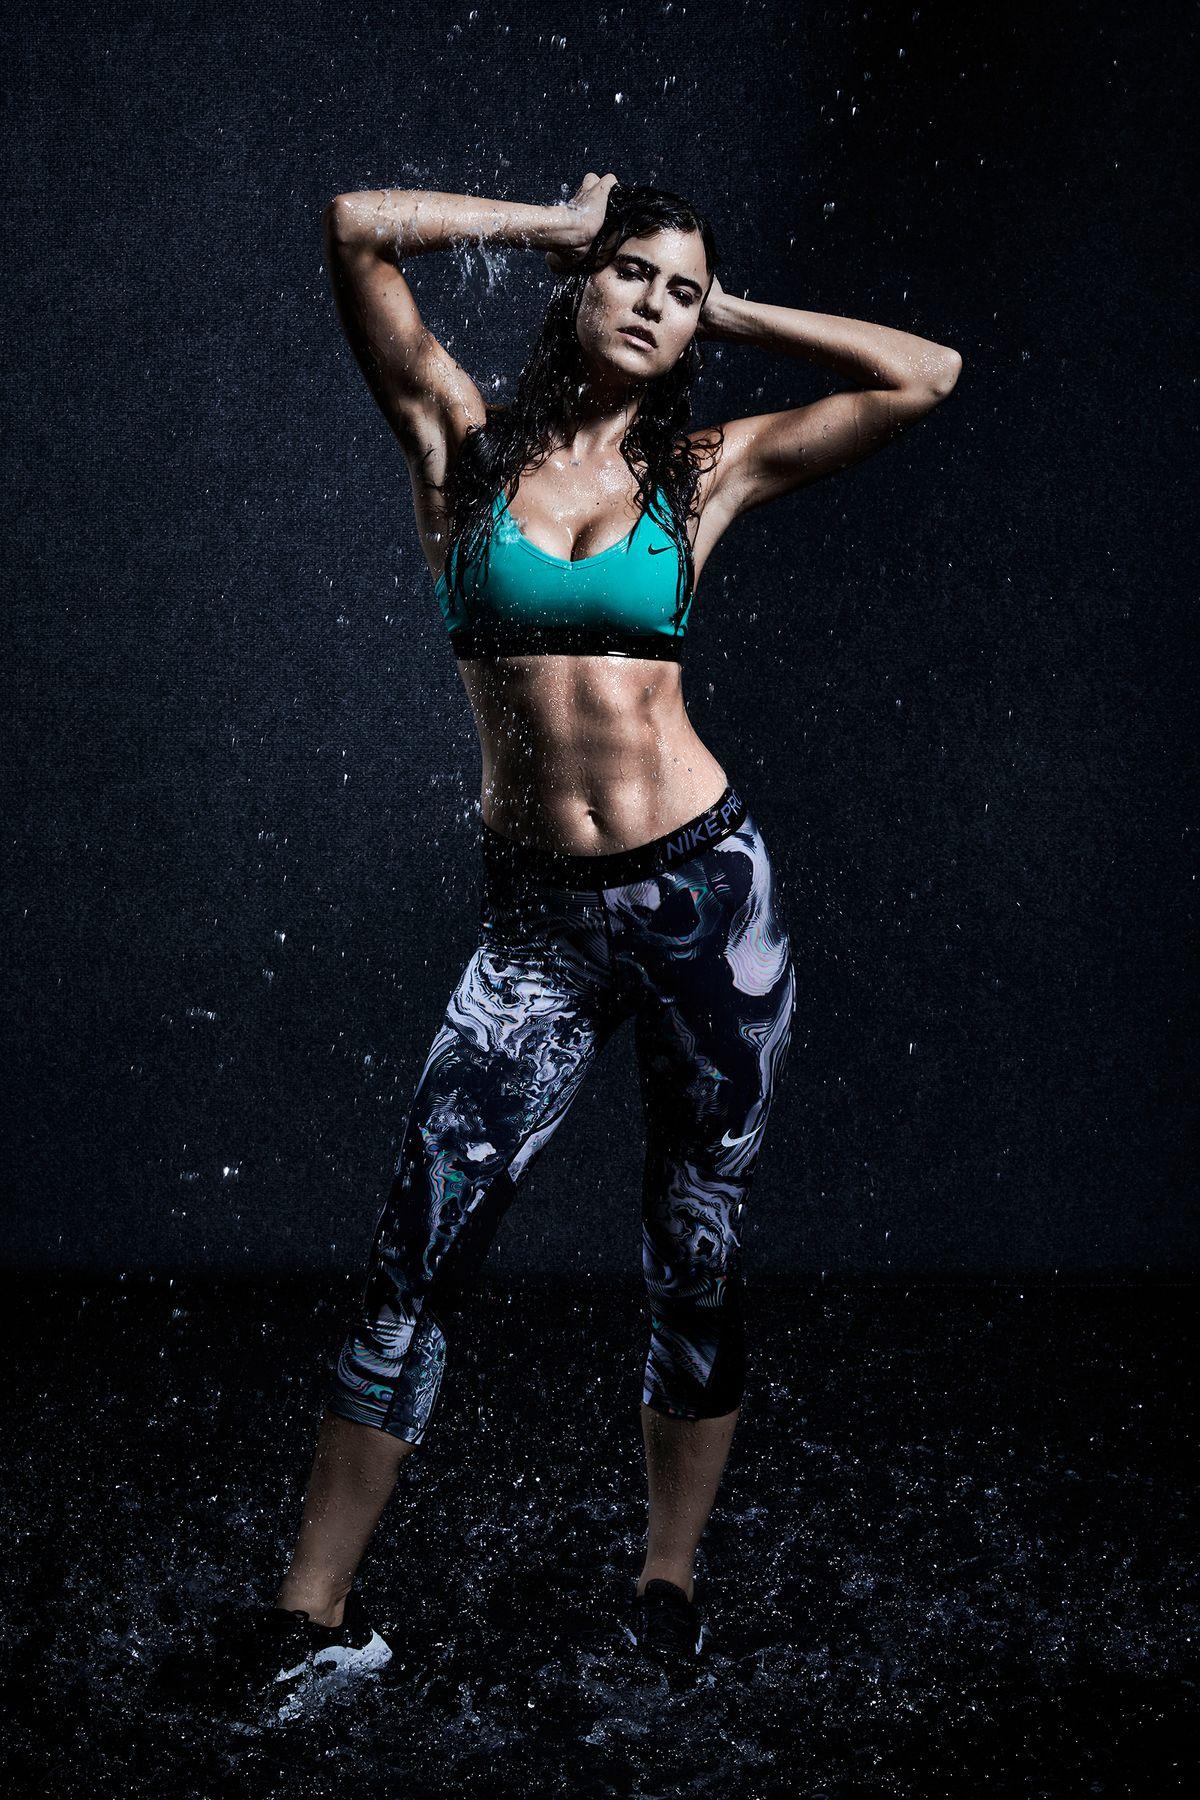 Breanna_Fitness Rain_SHOT 1_053.jpg